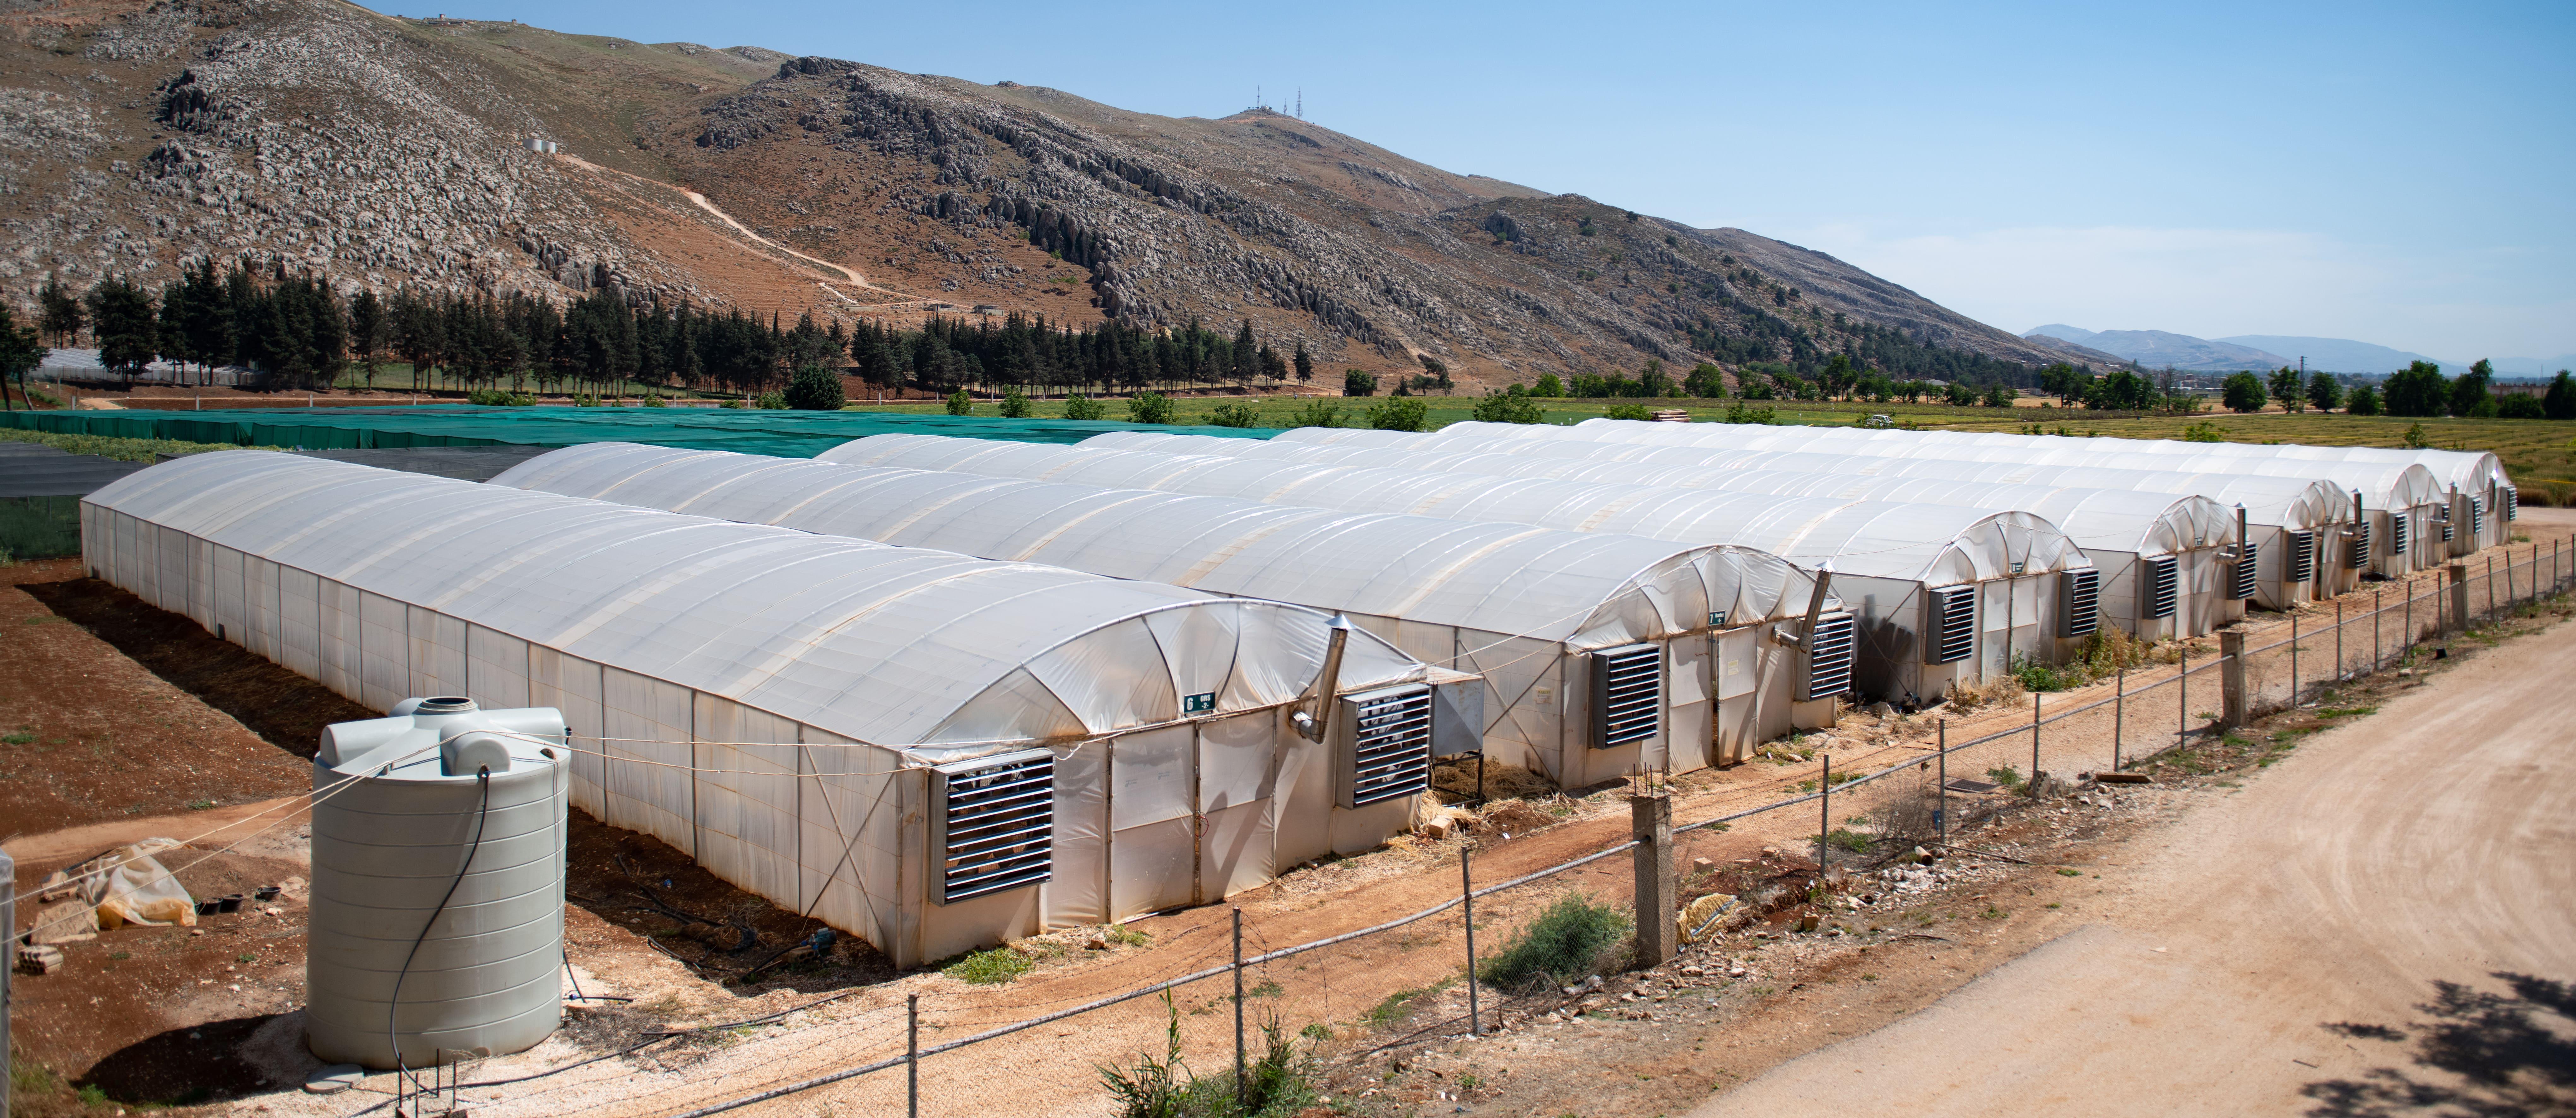 Plastic houses, ICARDA Terbol Station in Lebanon.